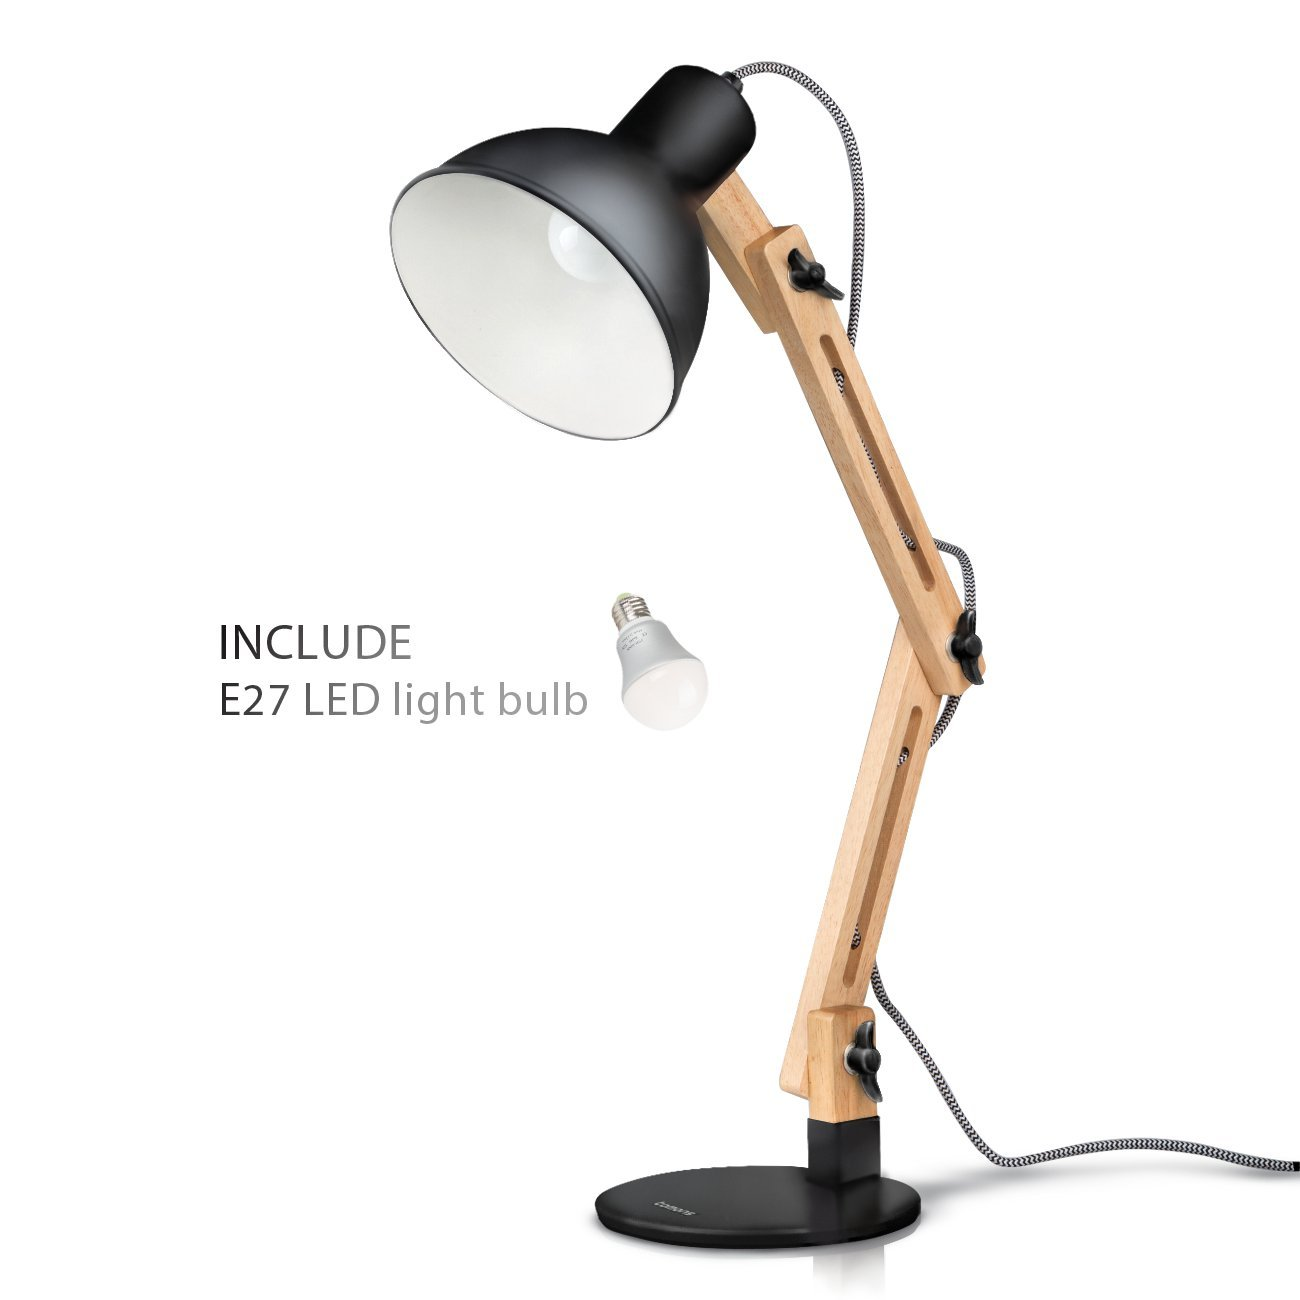 Tomons Dcoration Lampe de Table LED Lampe de Bureau Salon Design